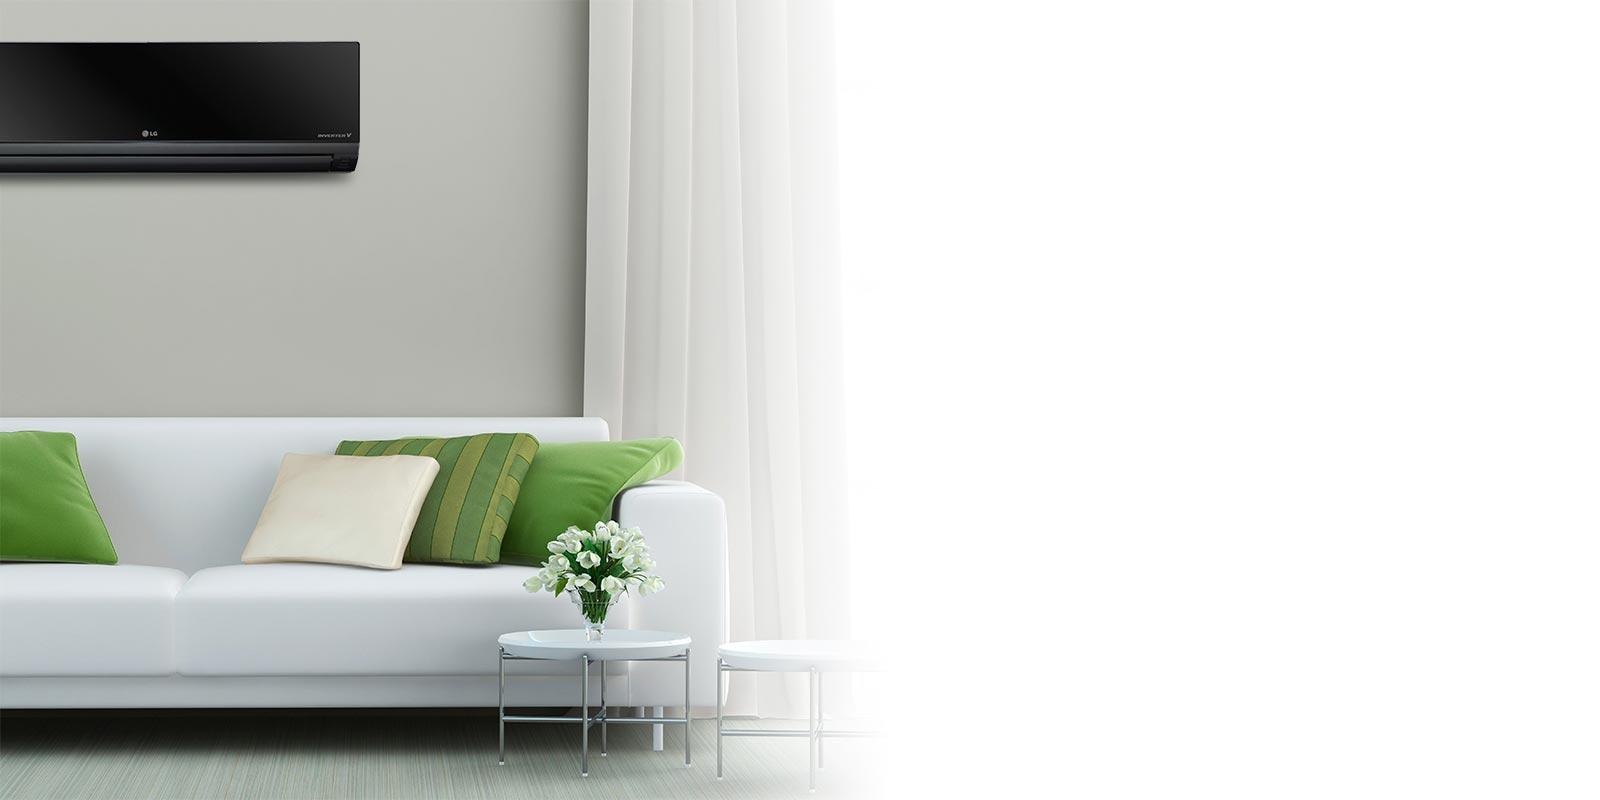 Aire acondicionado fr o calor split lg argentina for Cargar aire acondicionado casa